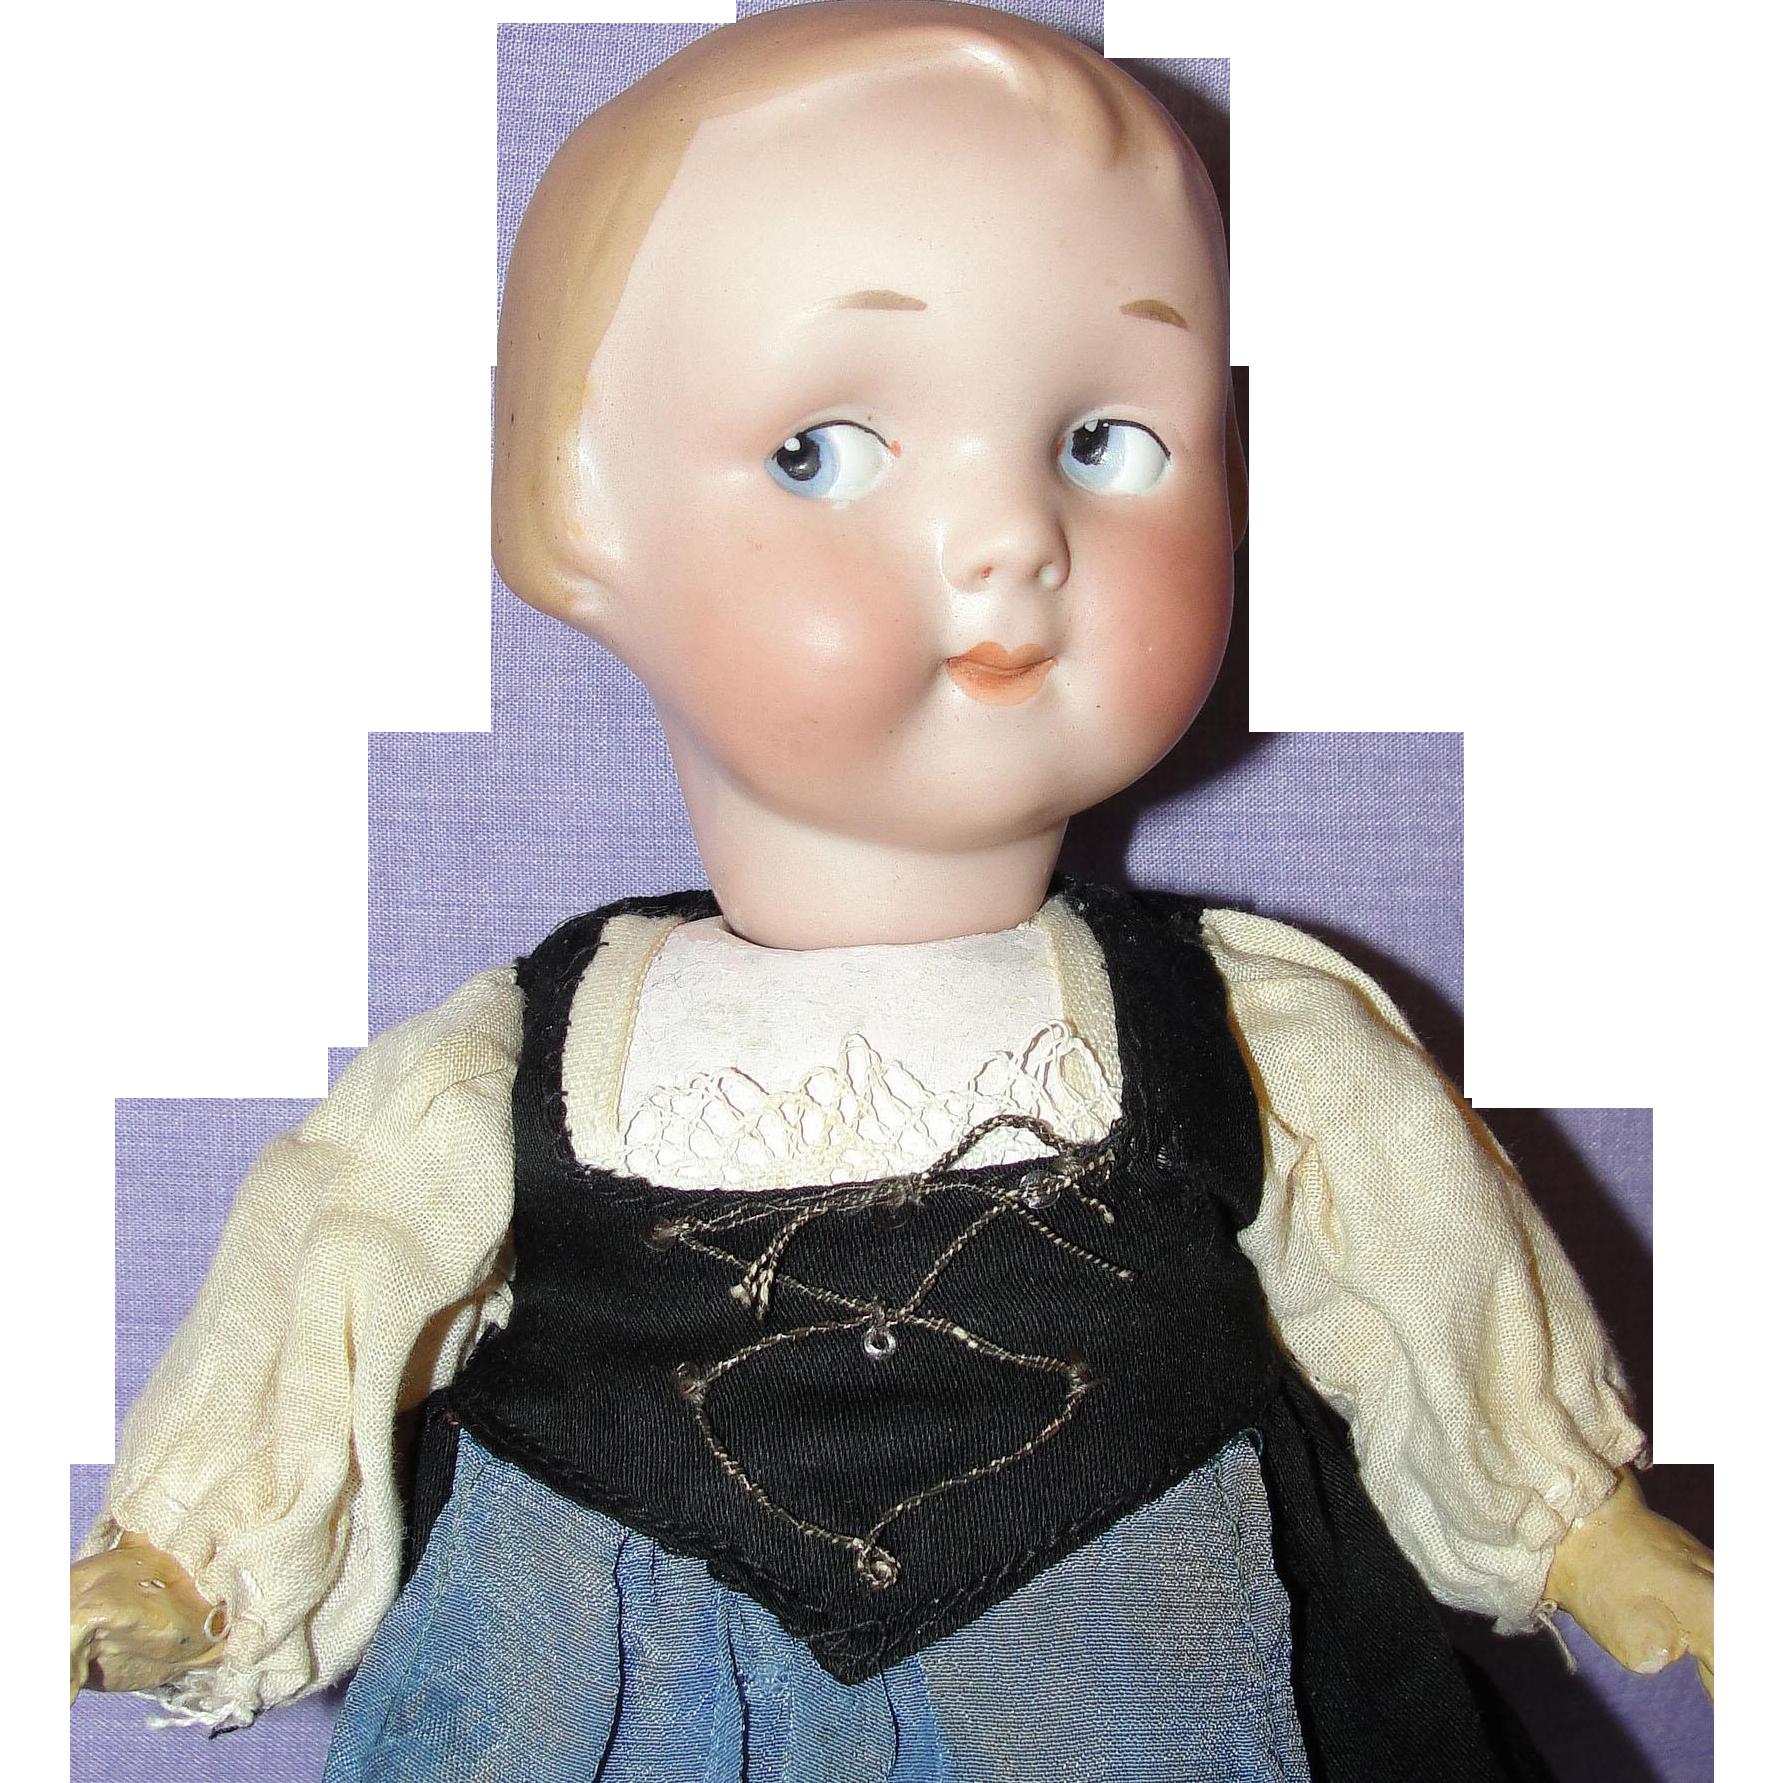 "All Original 9-1/2"" Antique German Armand Marseille Googly Doll"